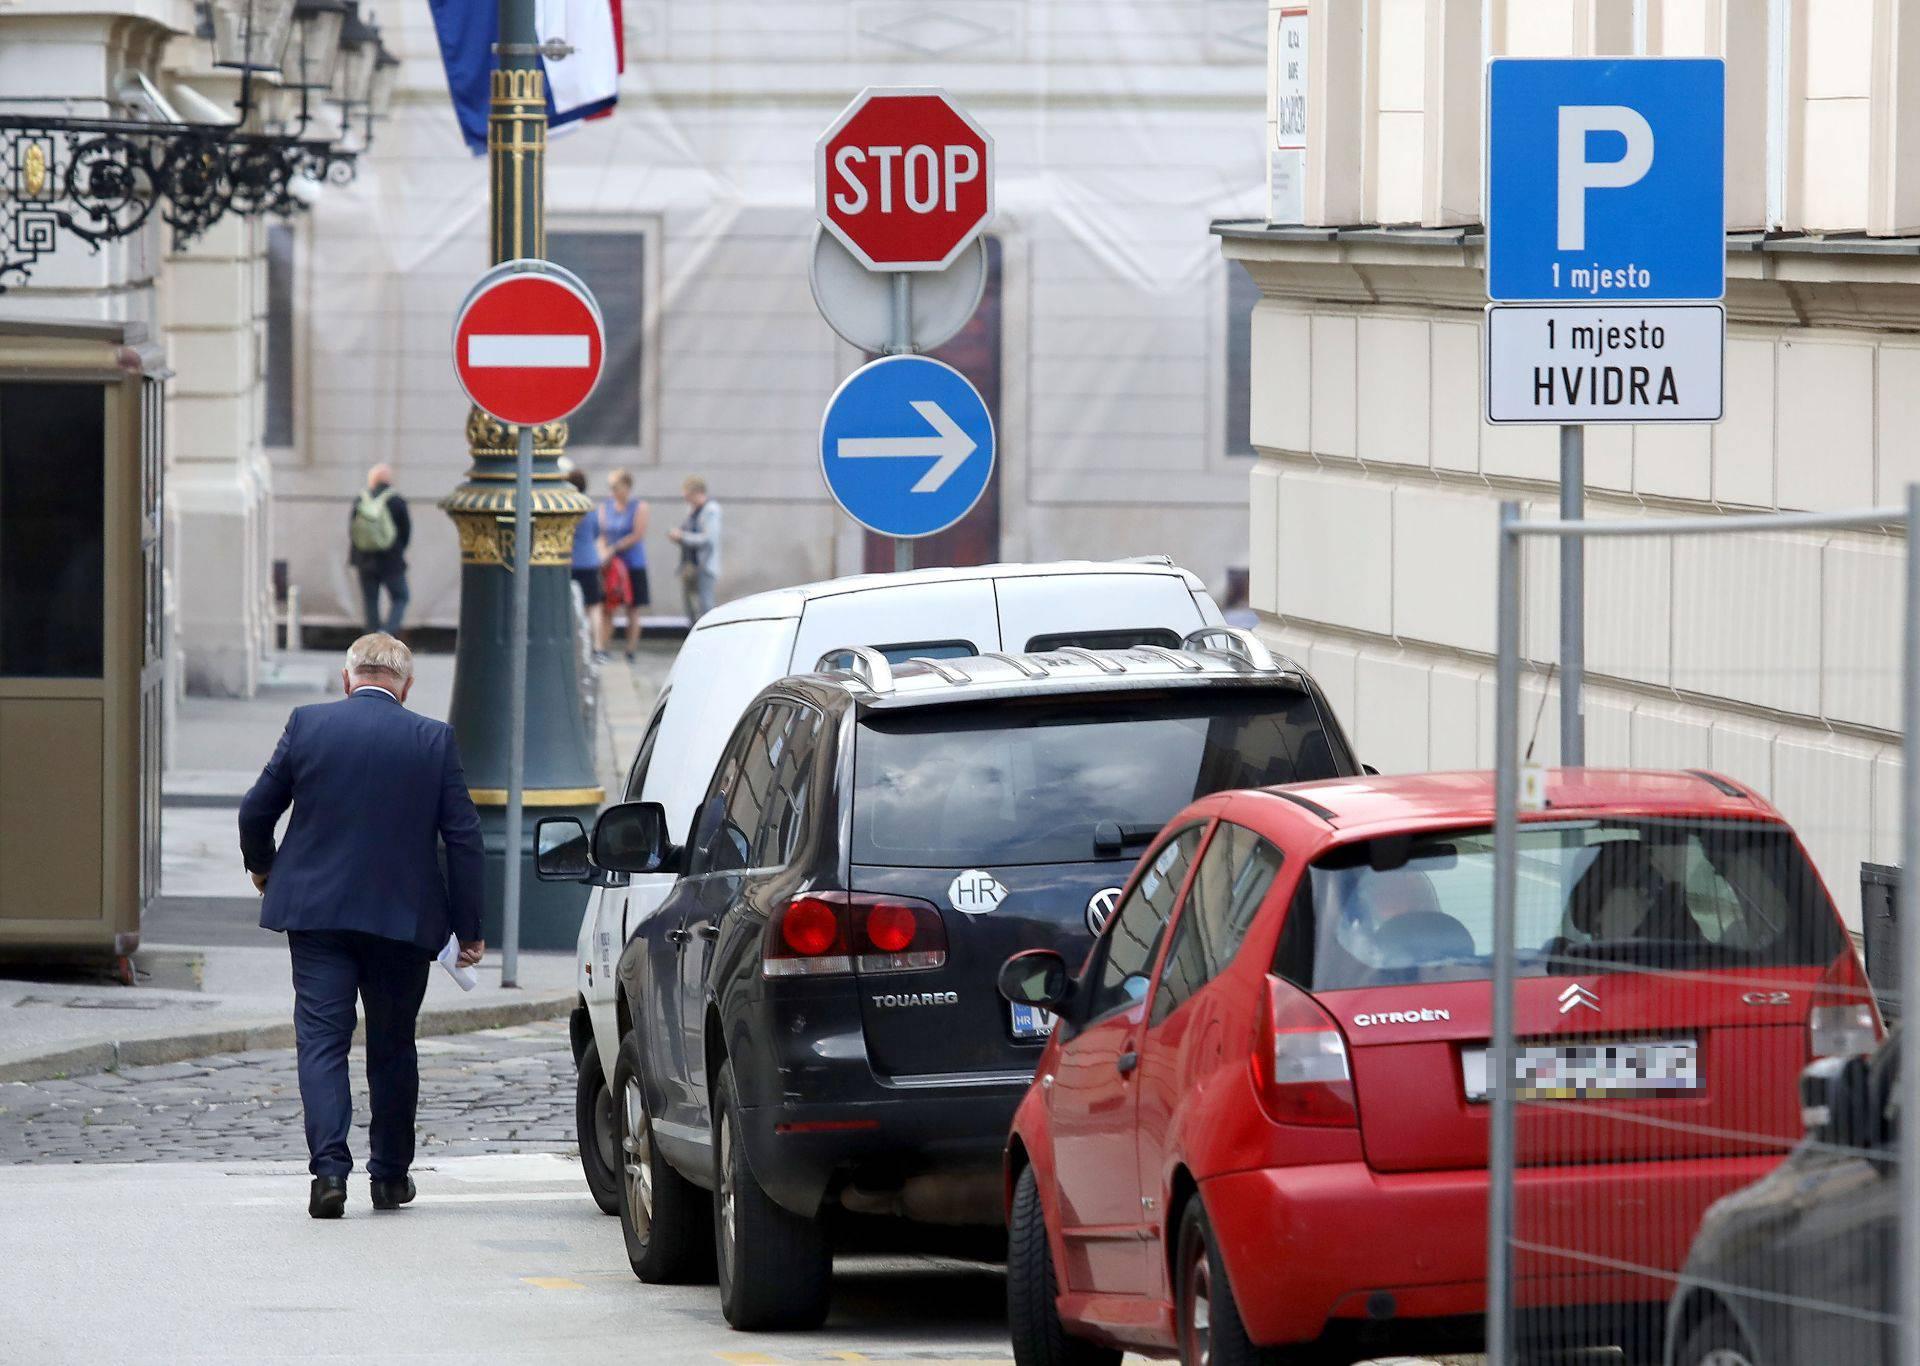 Dok ostali zastupnici plaćaju parking, Đakić parkira 'mukte'